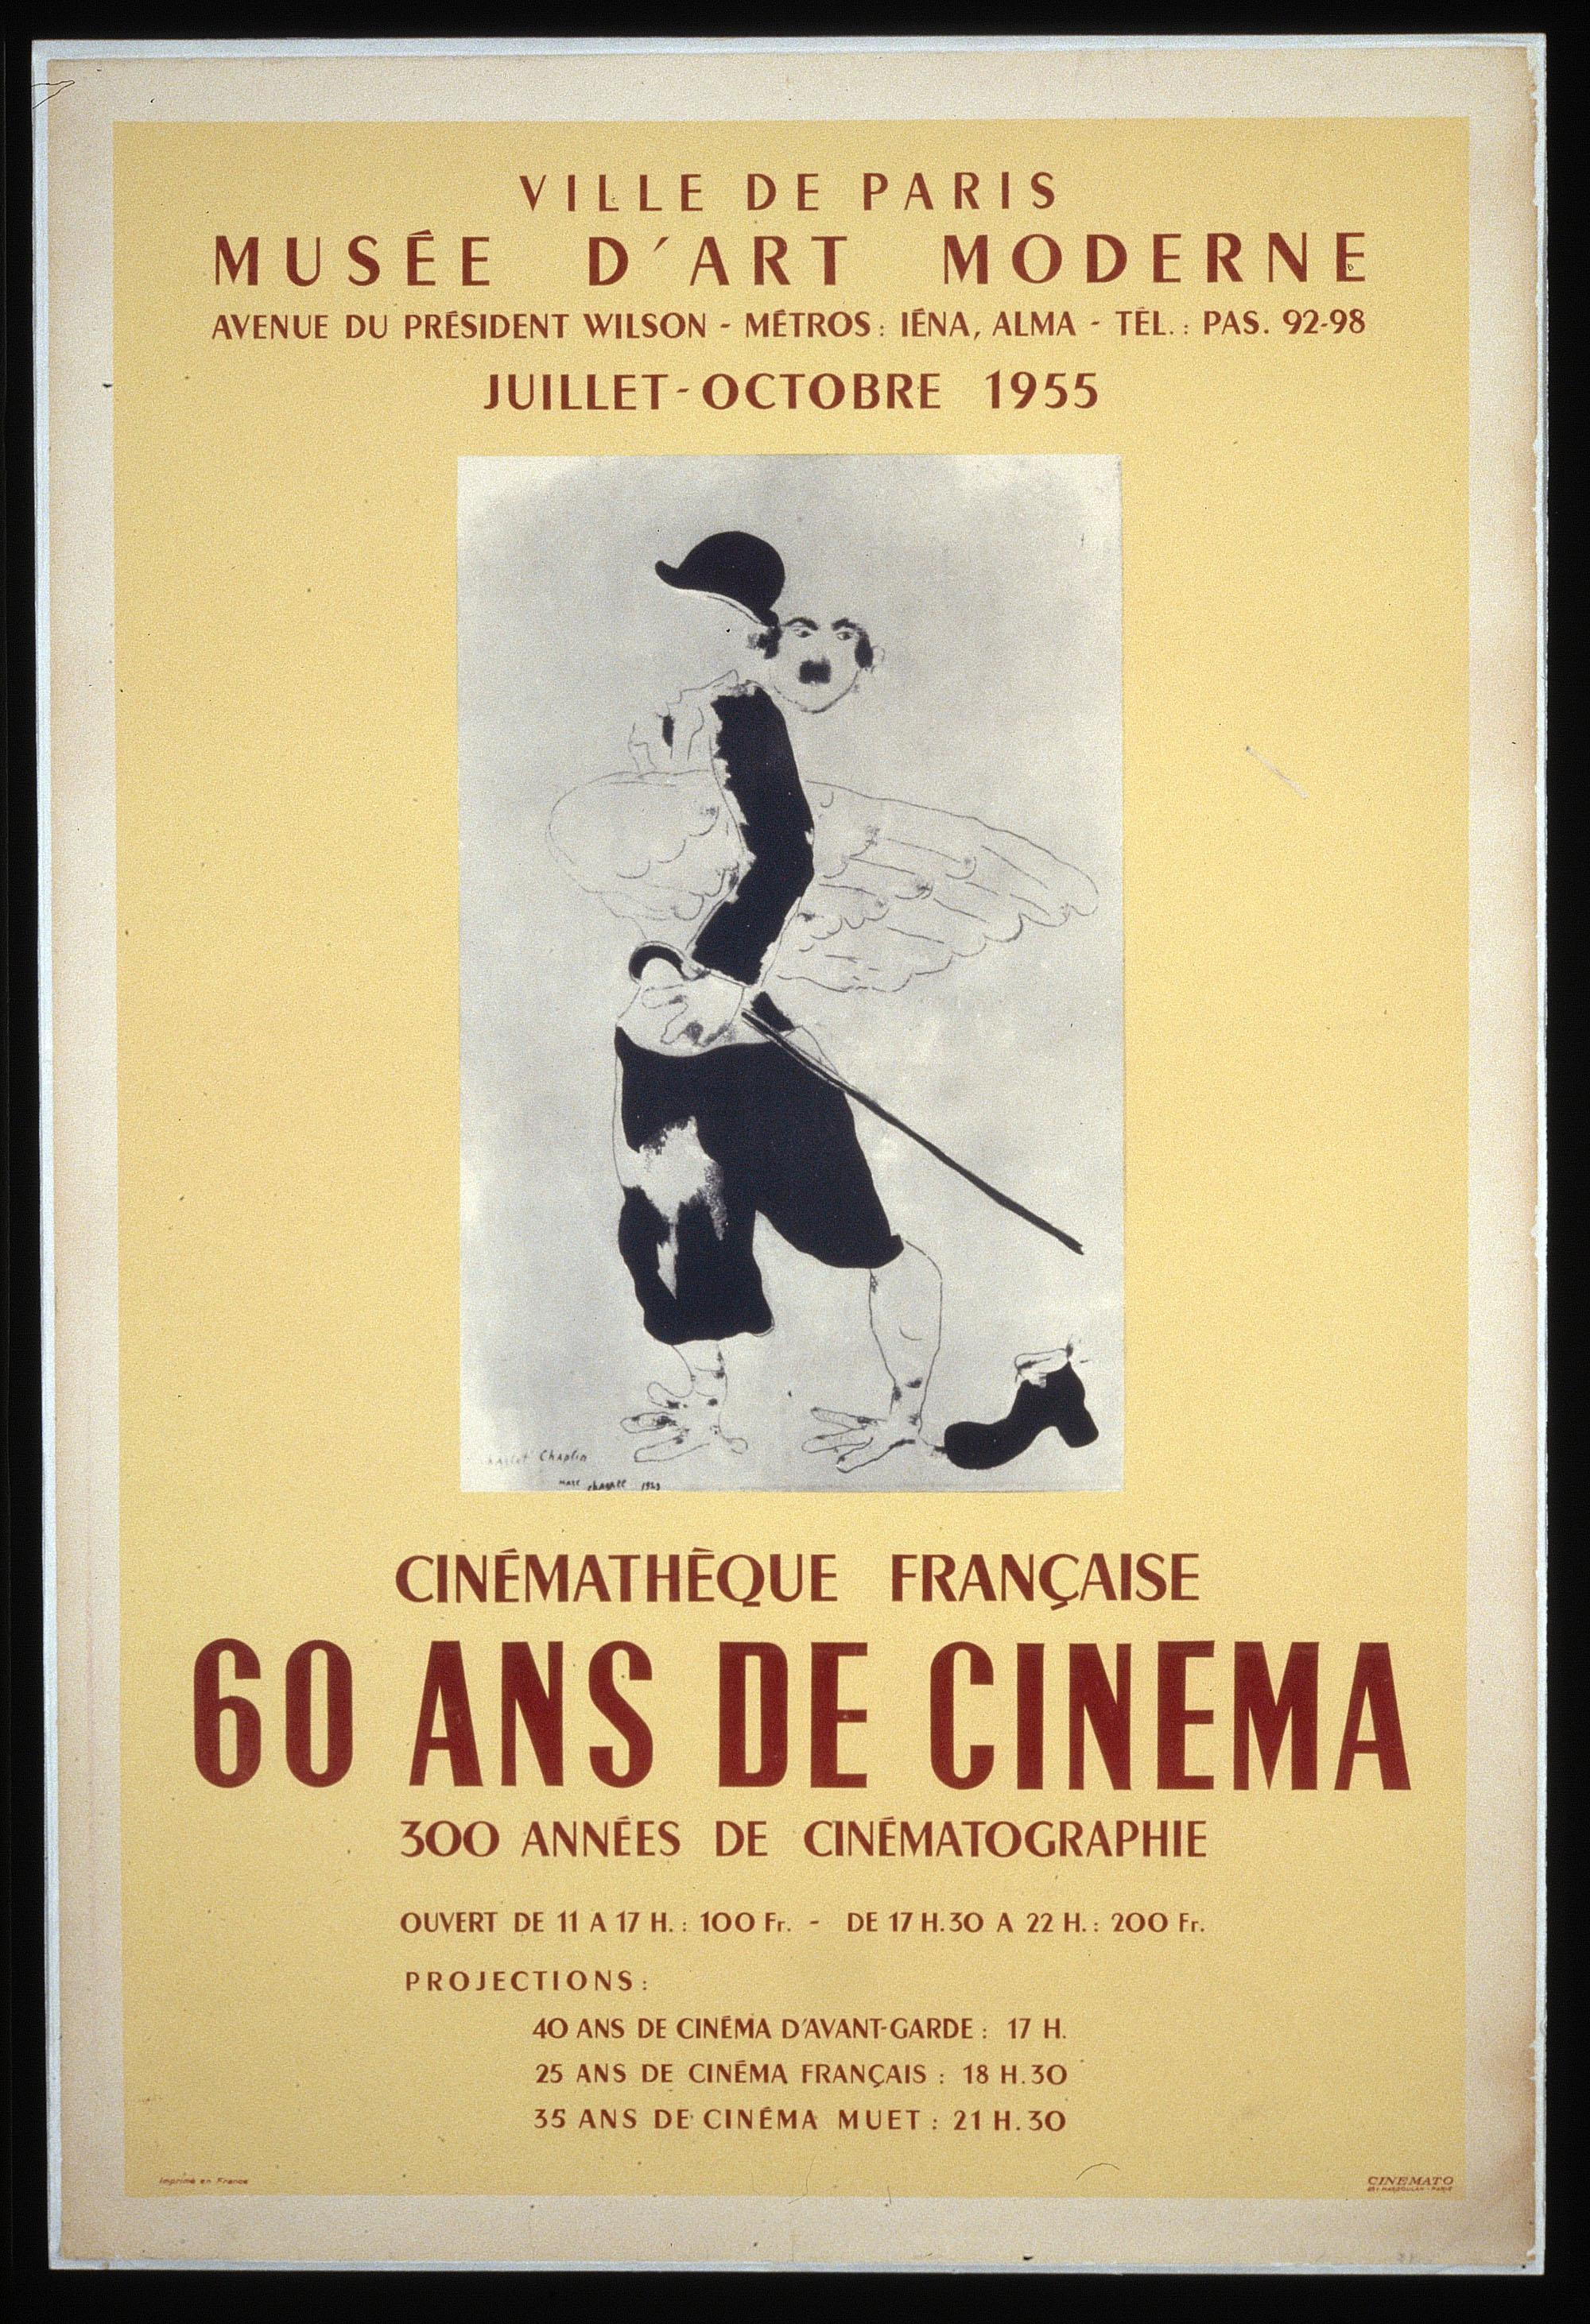 Dessin de Marc Chagall, 1955 © ADAGP, Paris 2014